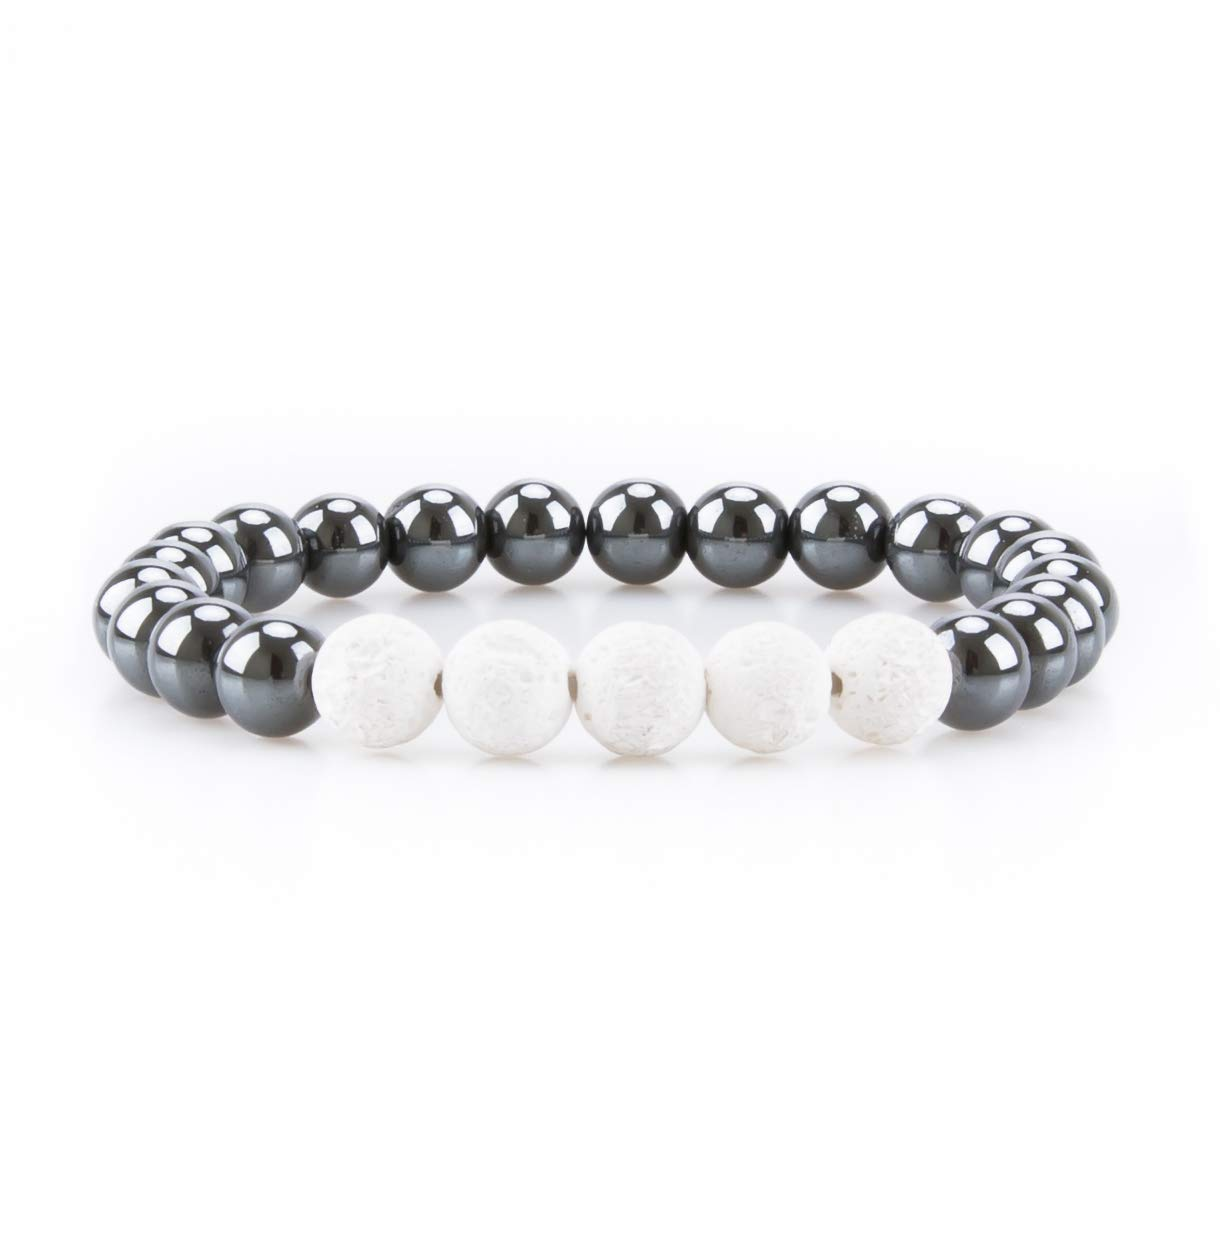 Bivei Hematite Magnetic Therapy Lava Stone Bead Essential Oil Diffuser Bracelet Pain Relief anbivi11122044